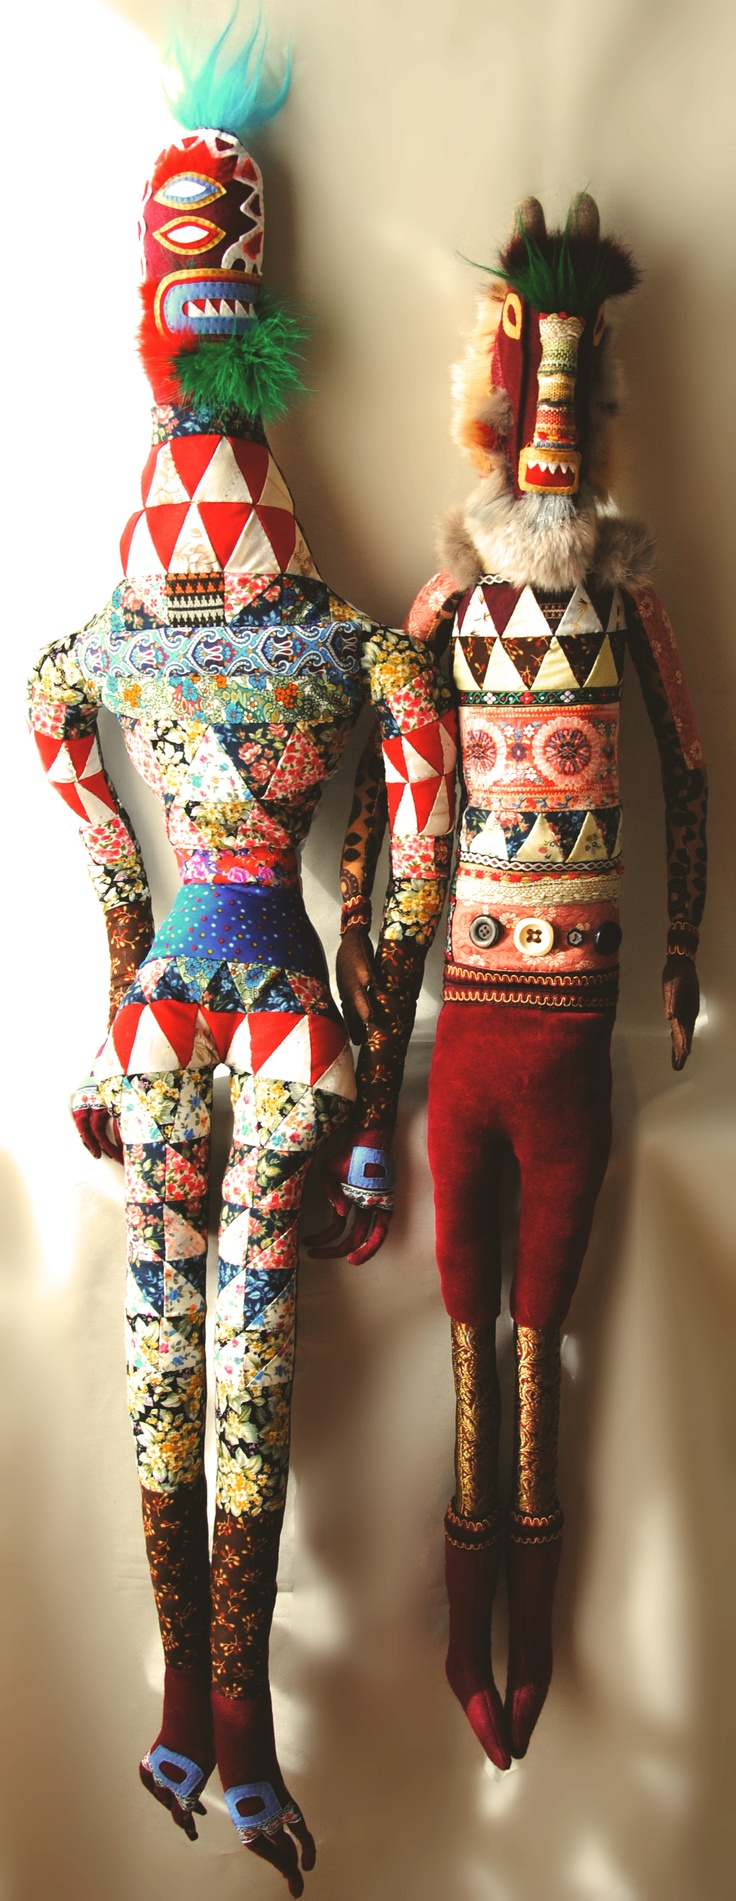 Muñecos de Pedro Tornero.